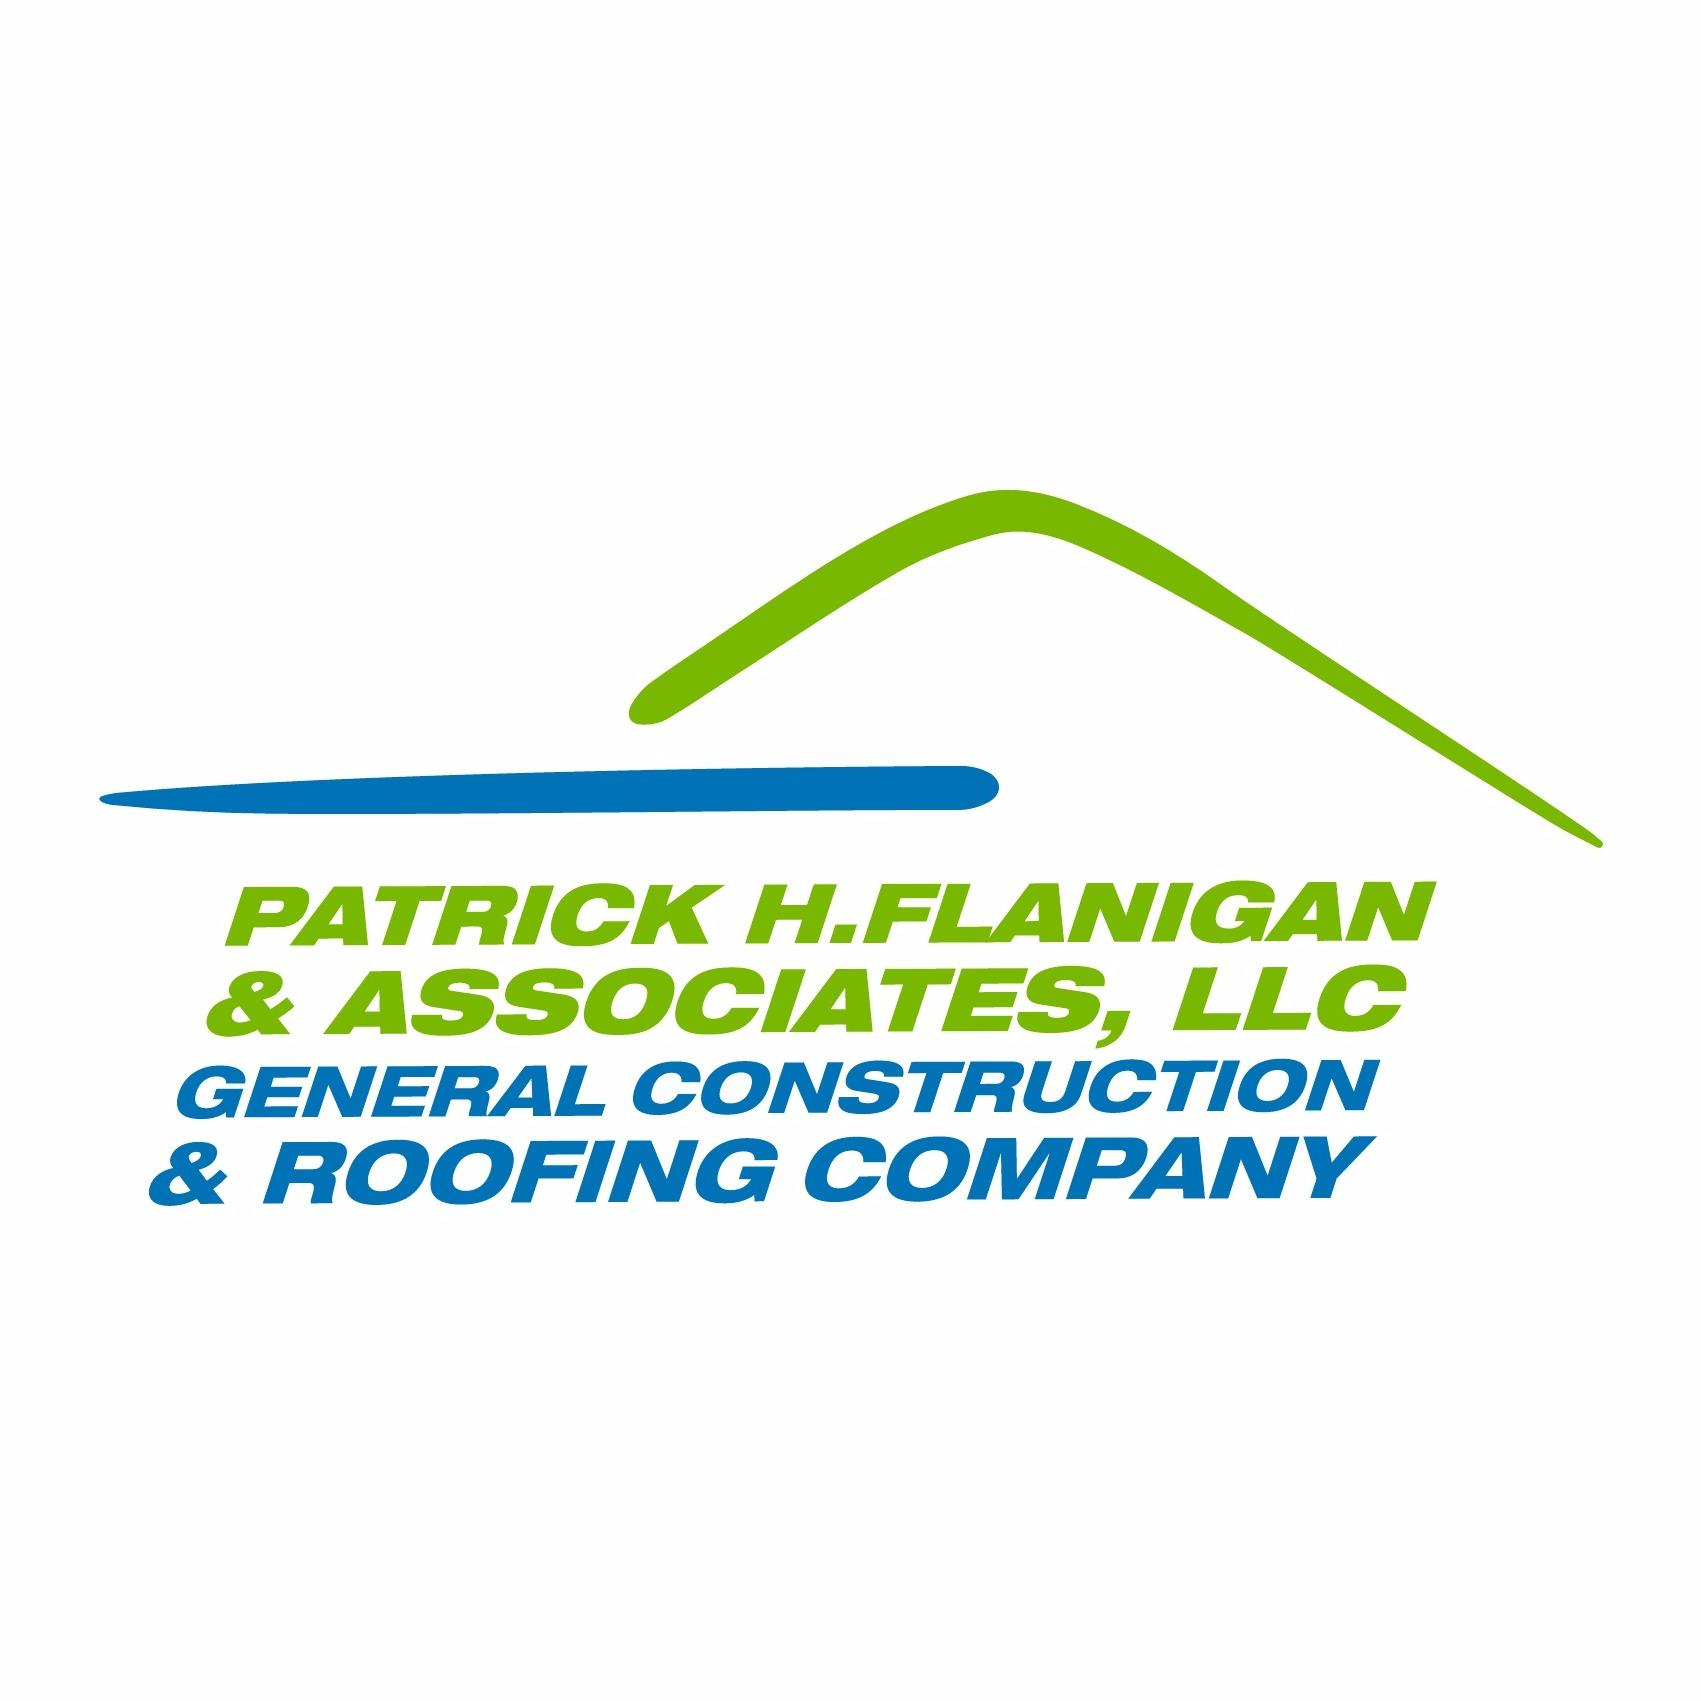 Patrick H. Flanigan & Associates